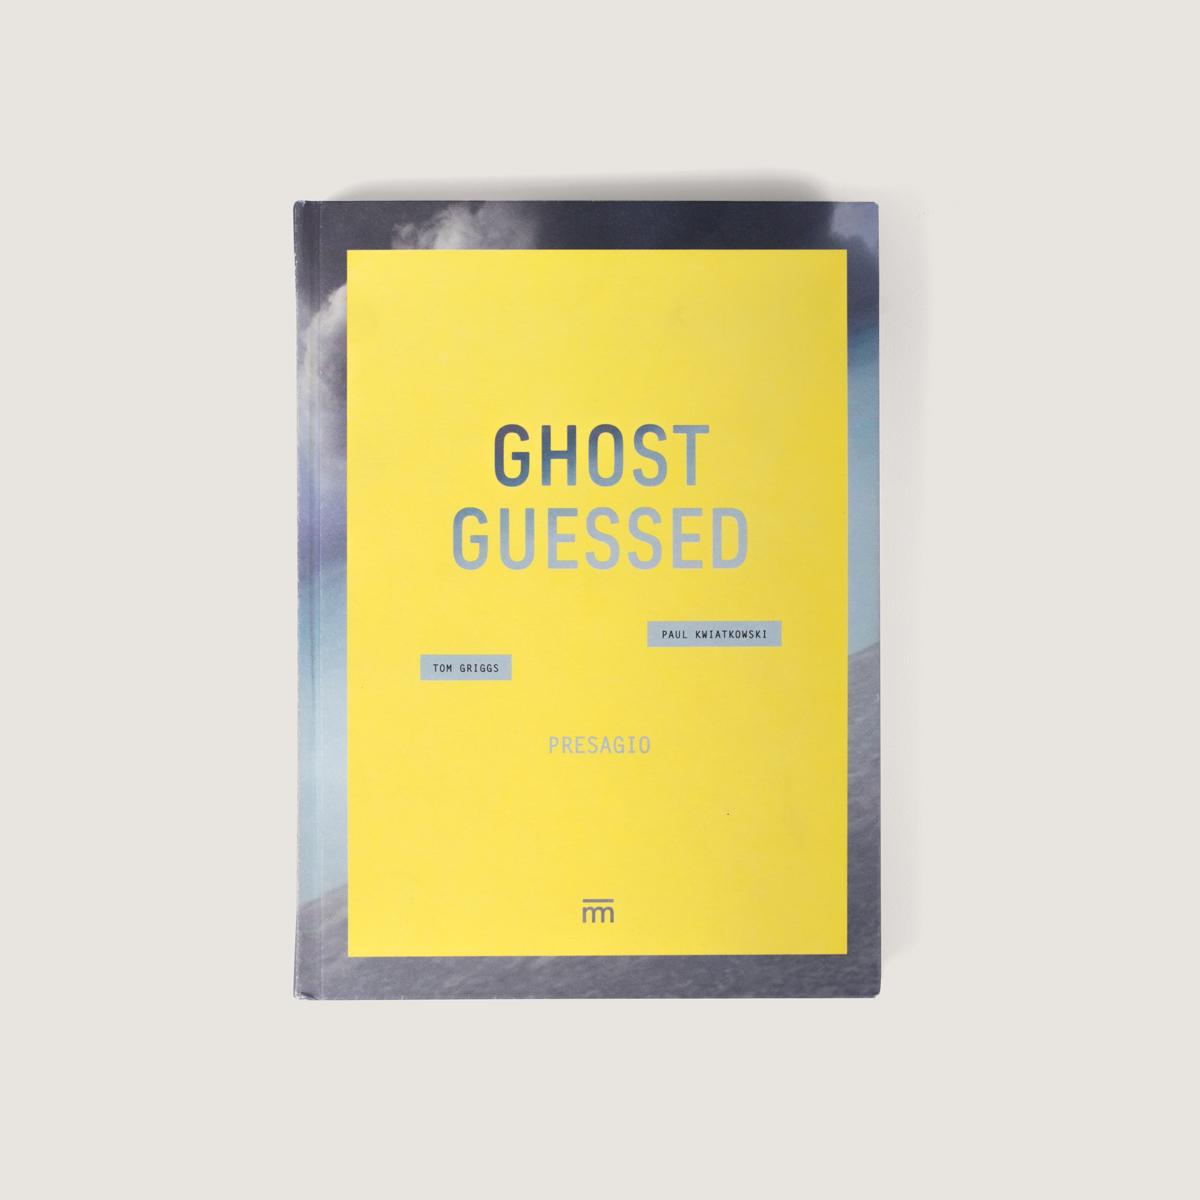 Ghost guessed /Paul Kwiatkowski, Tom Griggs  $50.000